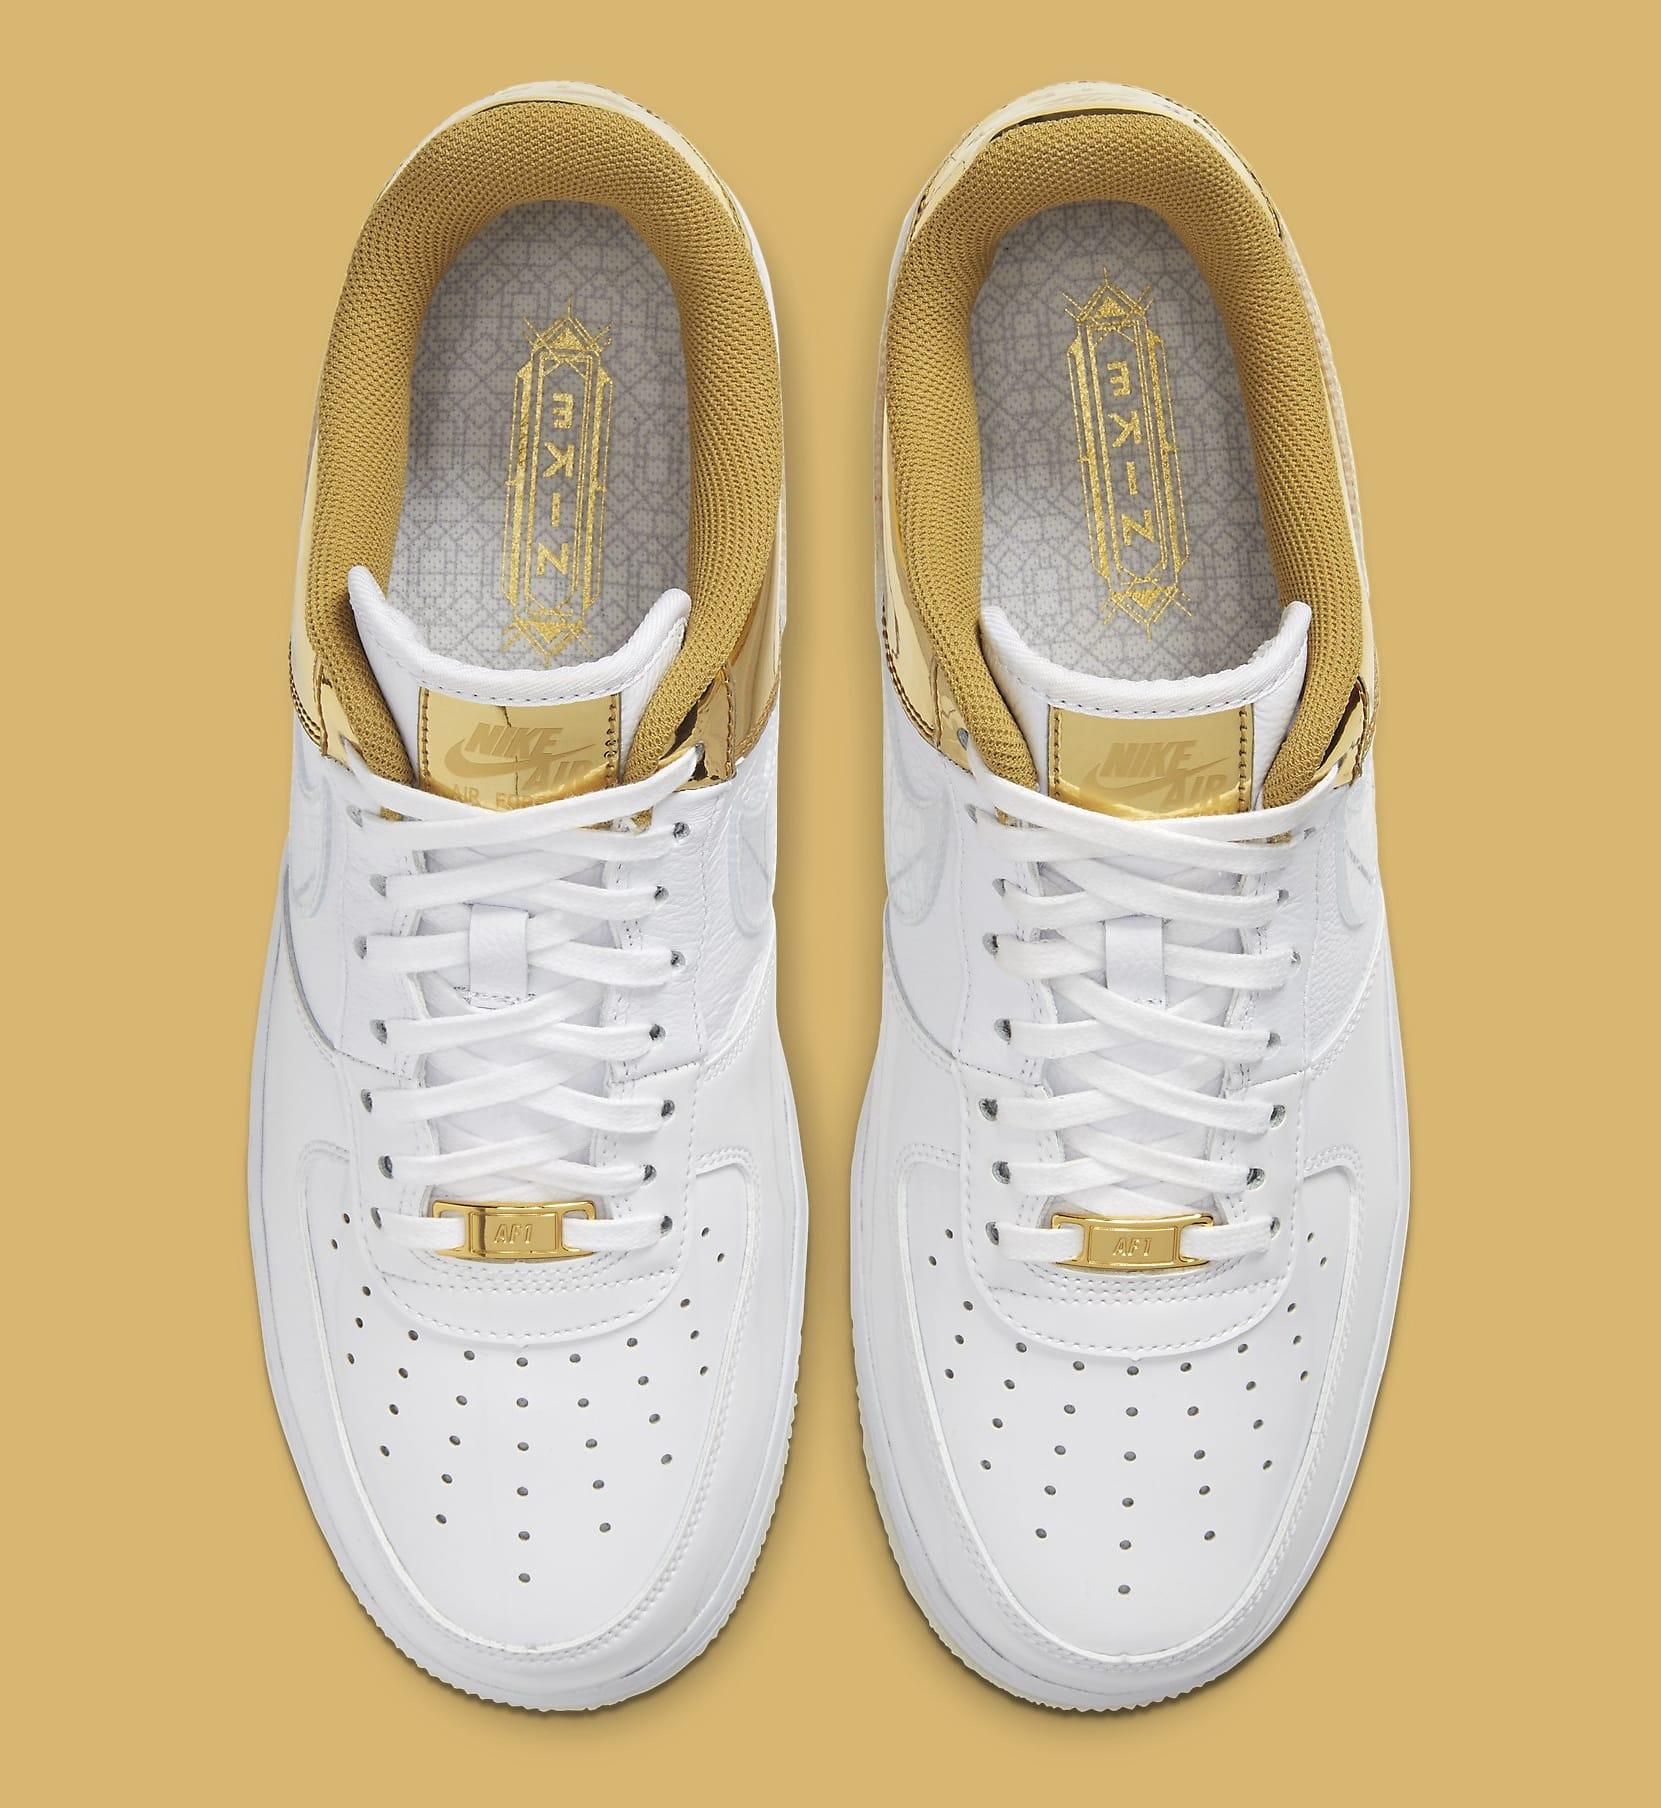 Nike Air Force 1 Shanghai CU2991 197 Release Info